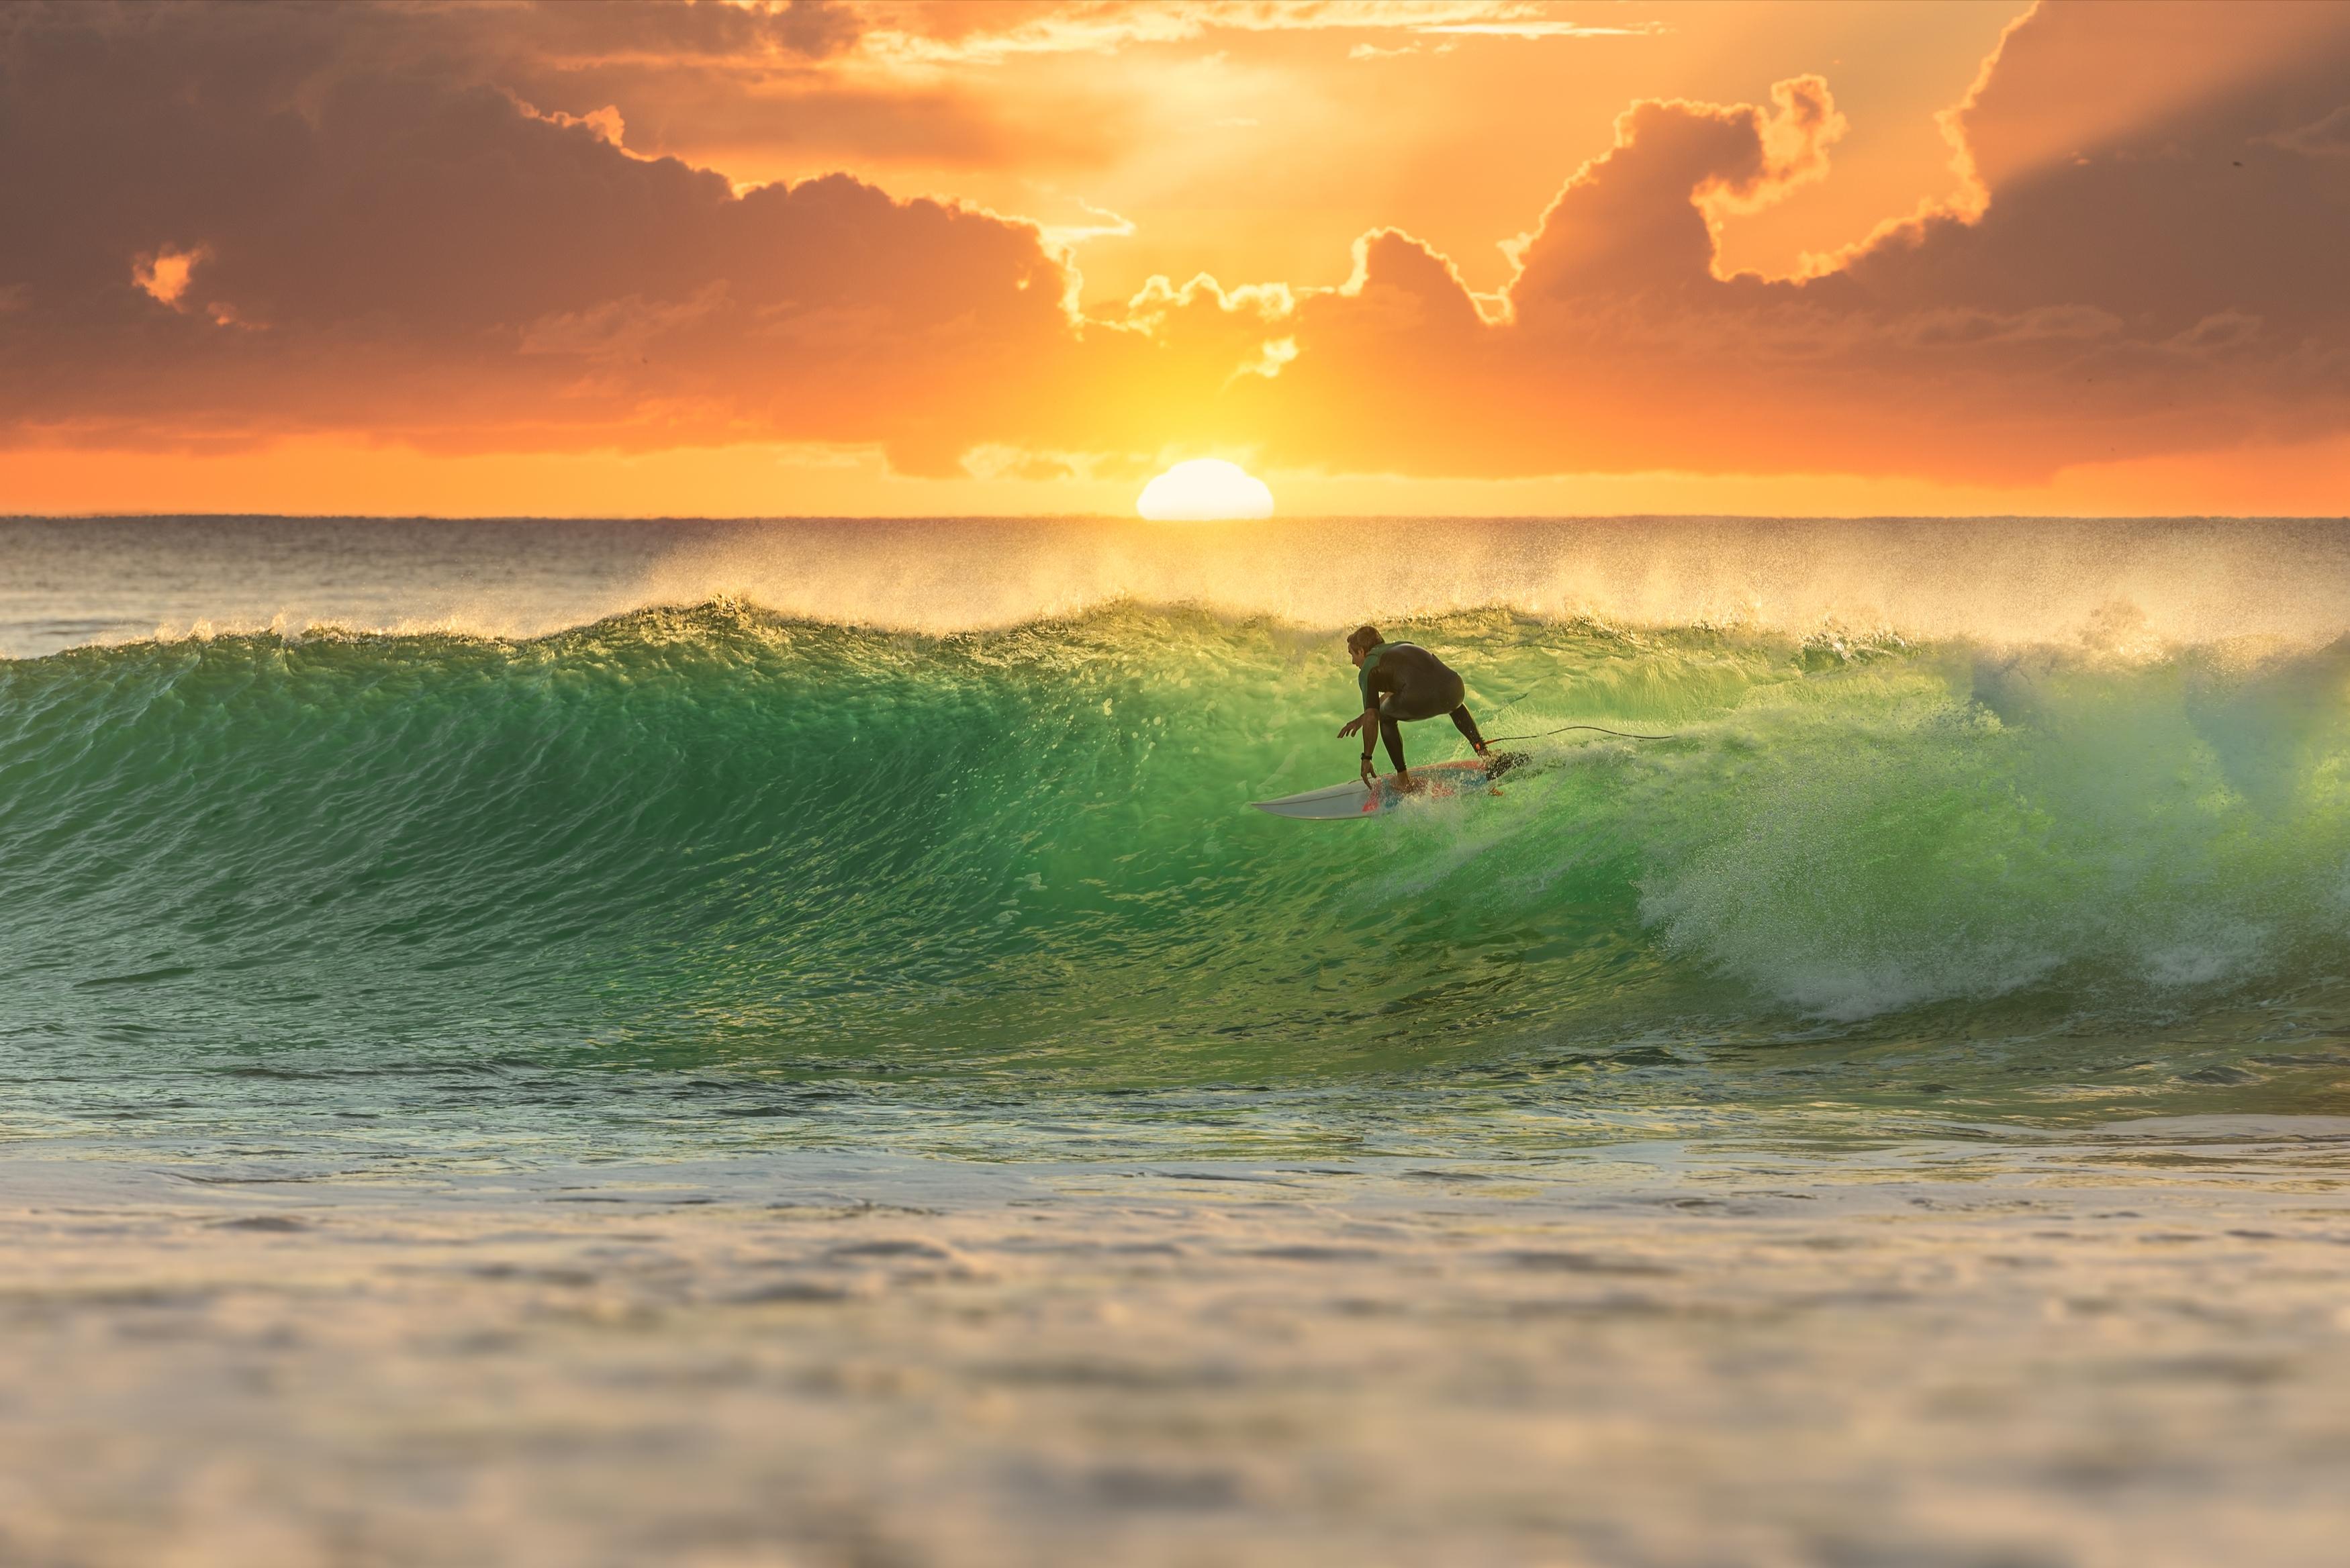 Siargao Surfer